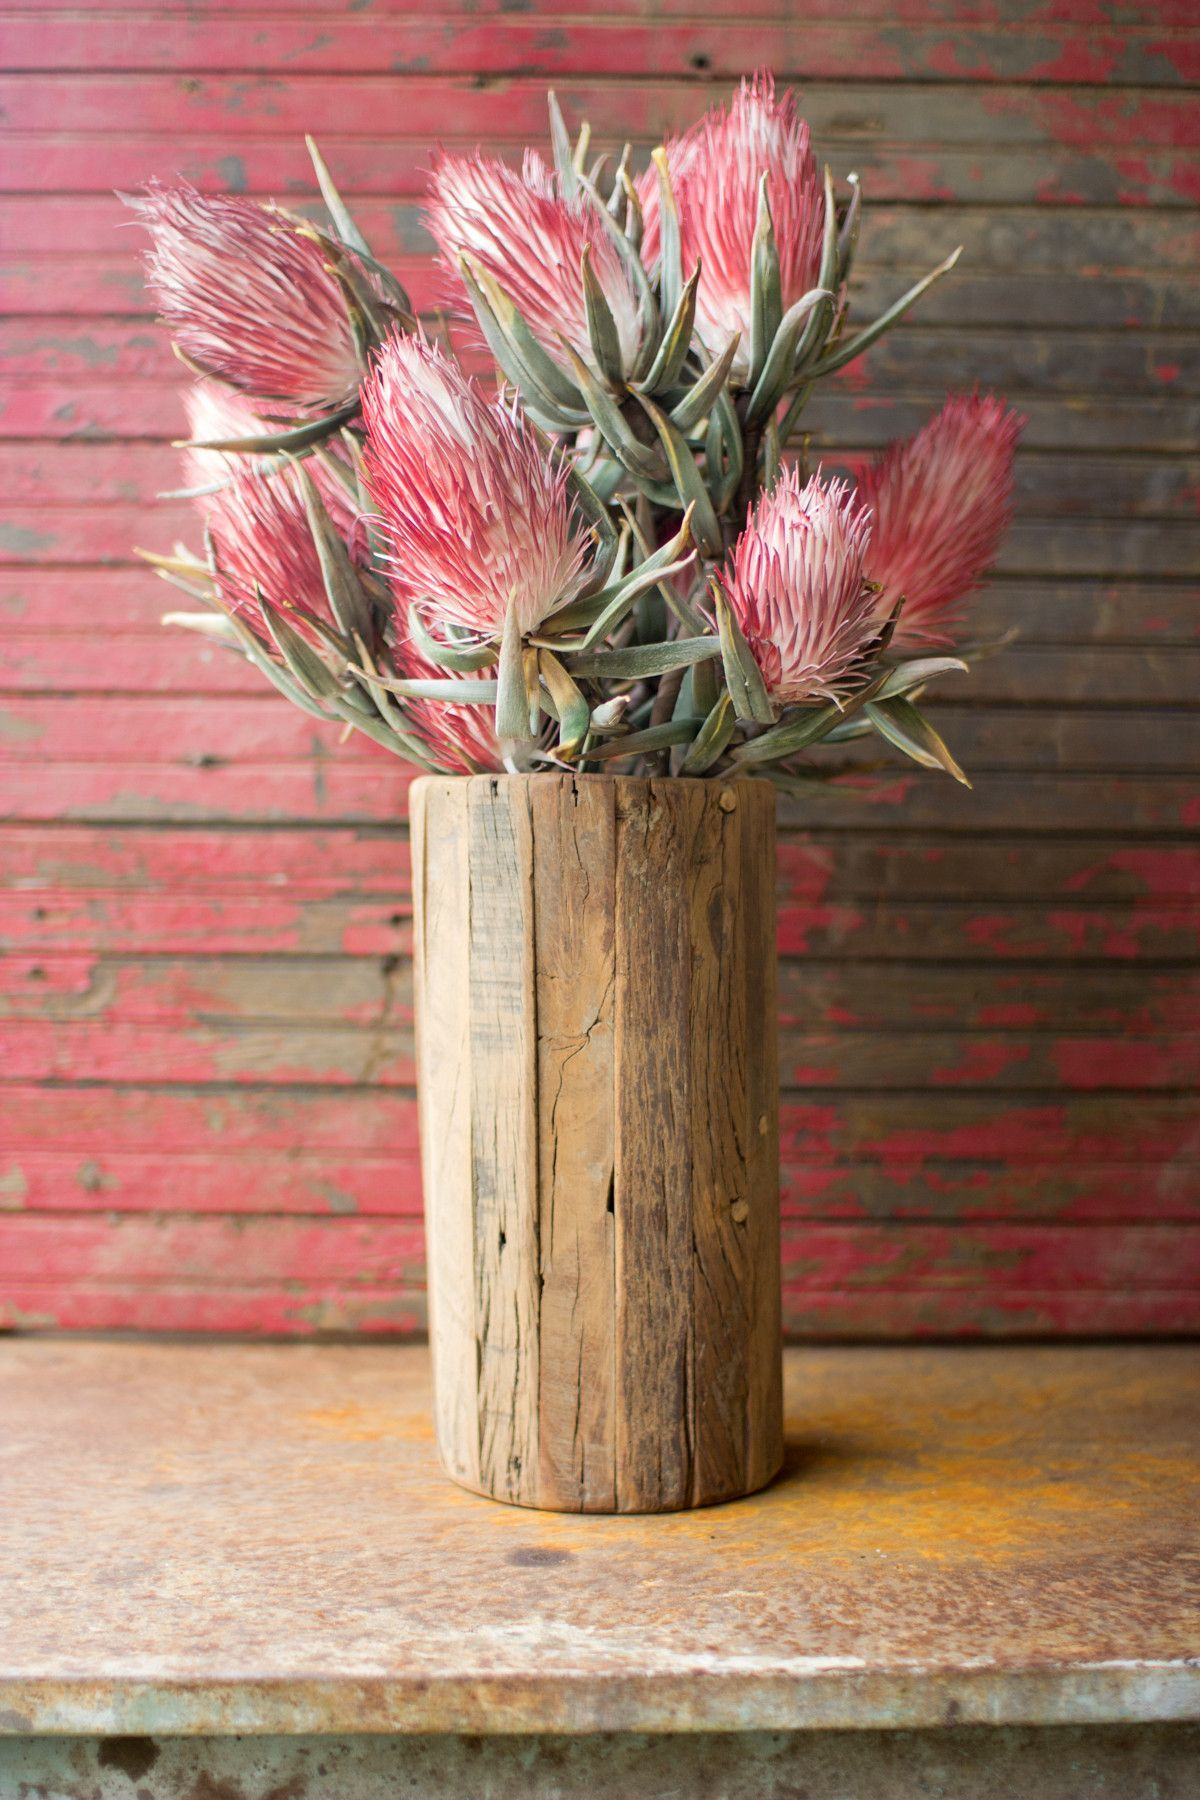 Gl Vase Upcycle on kitchen vase, chandelier vase, flowers vase, bathroom vase, yarn vase, steampunk vase, mod podge vase, wood vase, wedding vase, tree vase, crochet vase, car vase, printable vase, ribbon vase, homemade vase, chalkboard vase, easter vase, wire vase,